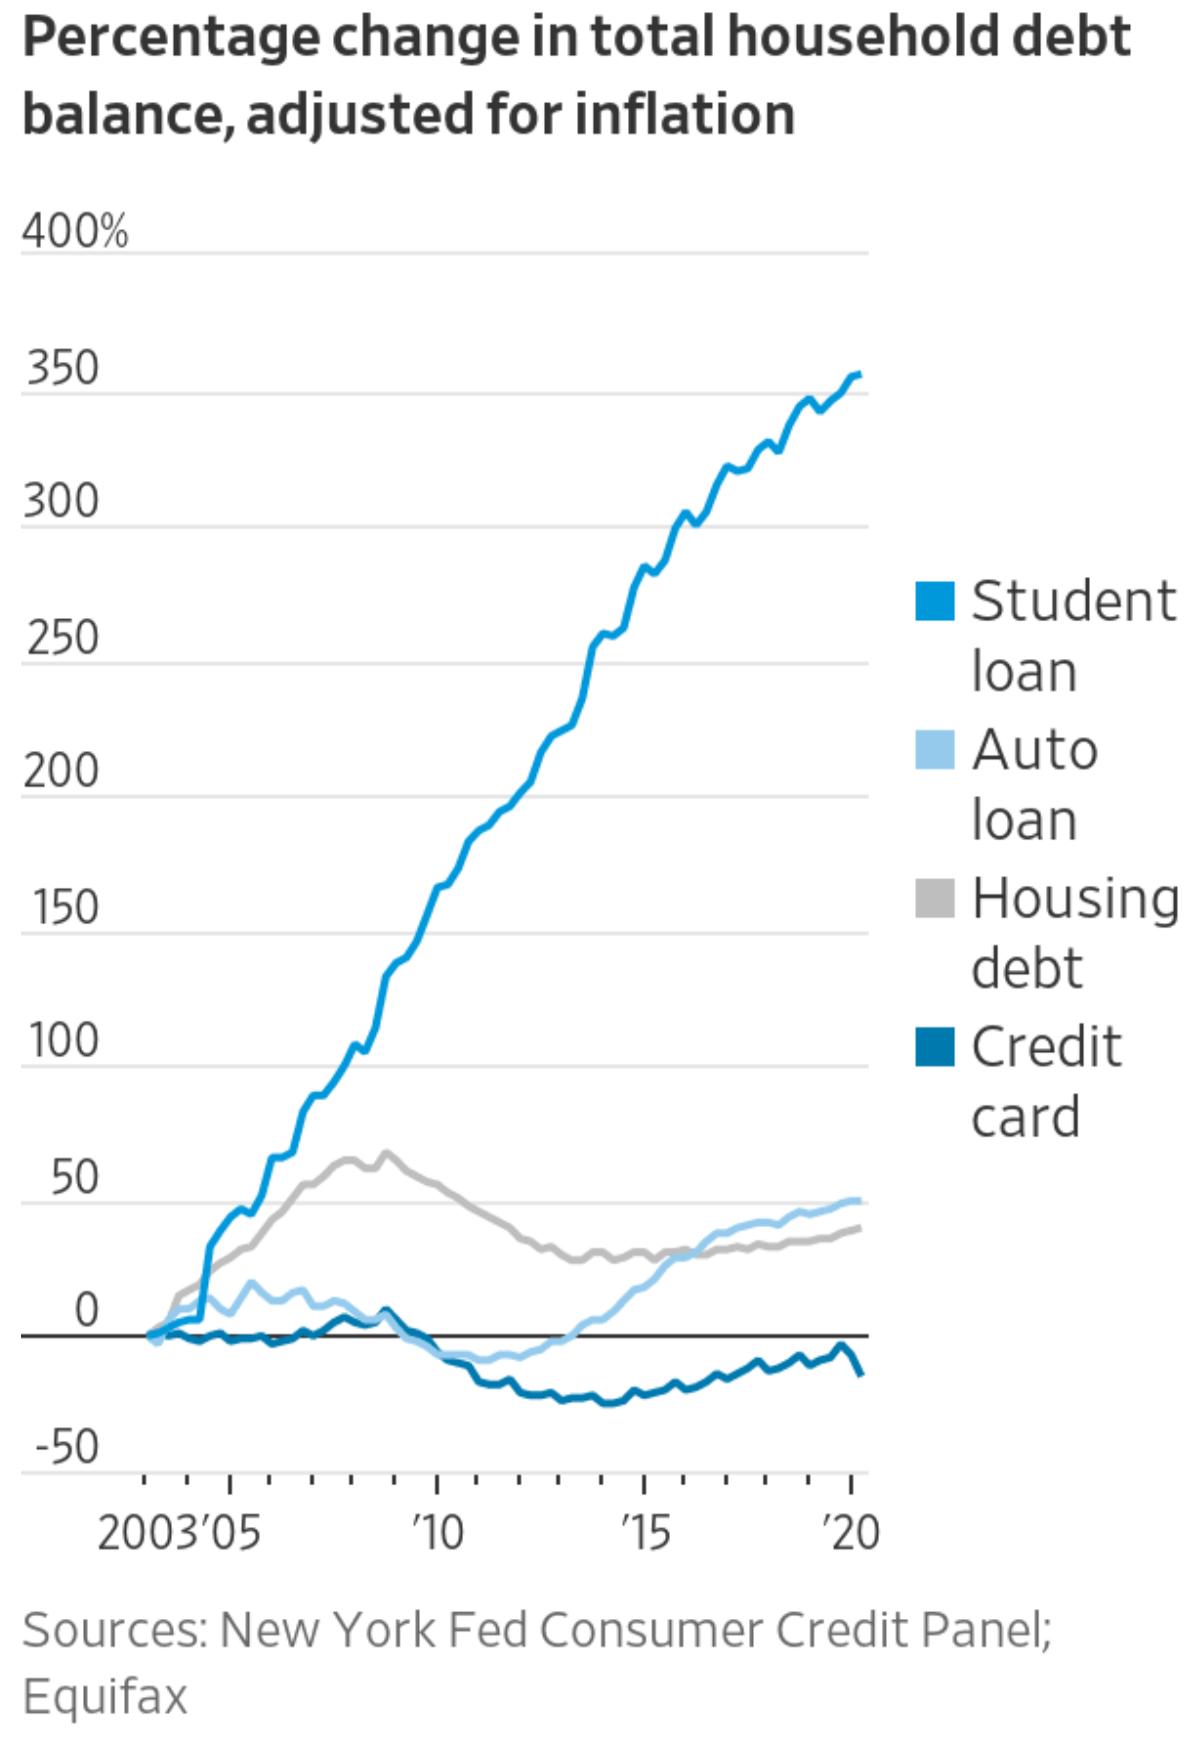 Is homeschooling a good idea? Student loan debt is massive